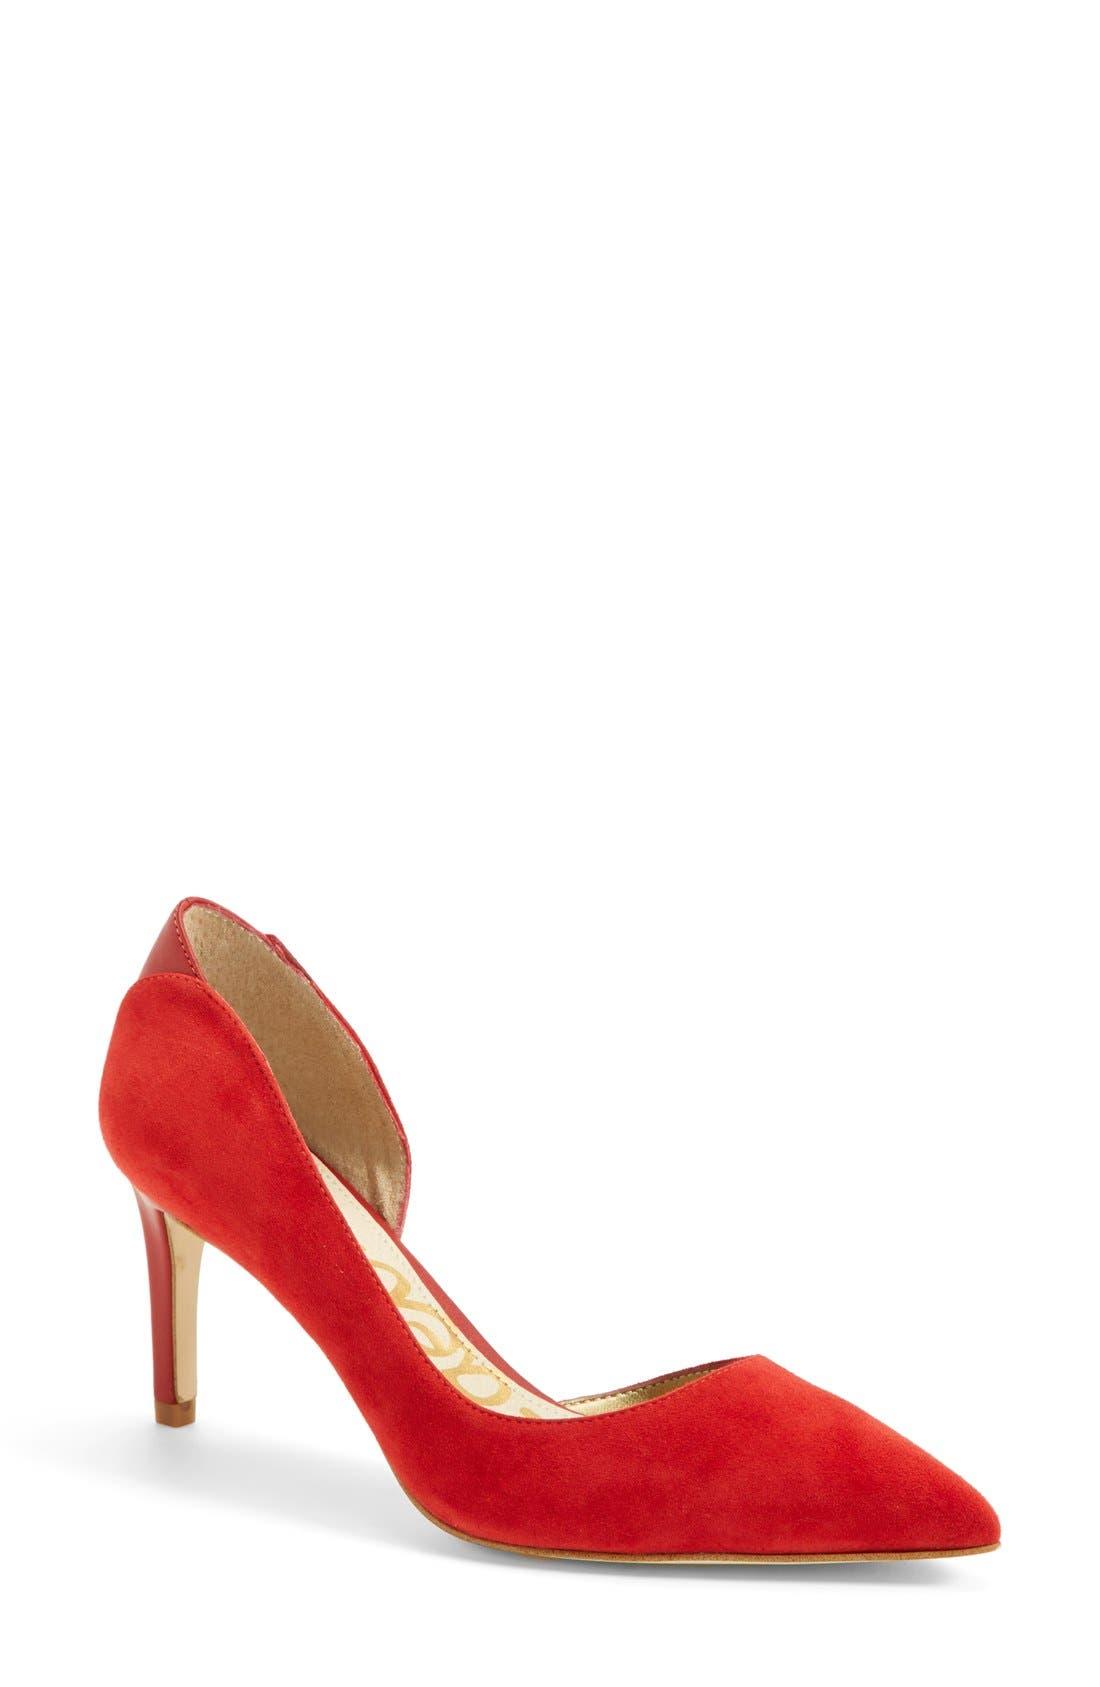 Main Image - Sam Edelman 'Onyx' Half d'Orsay Pointy Toe Pump (Women)